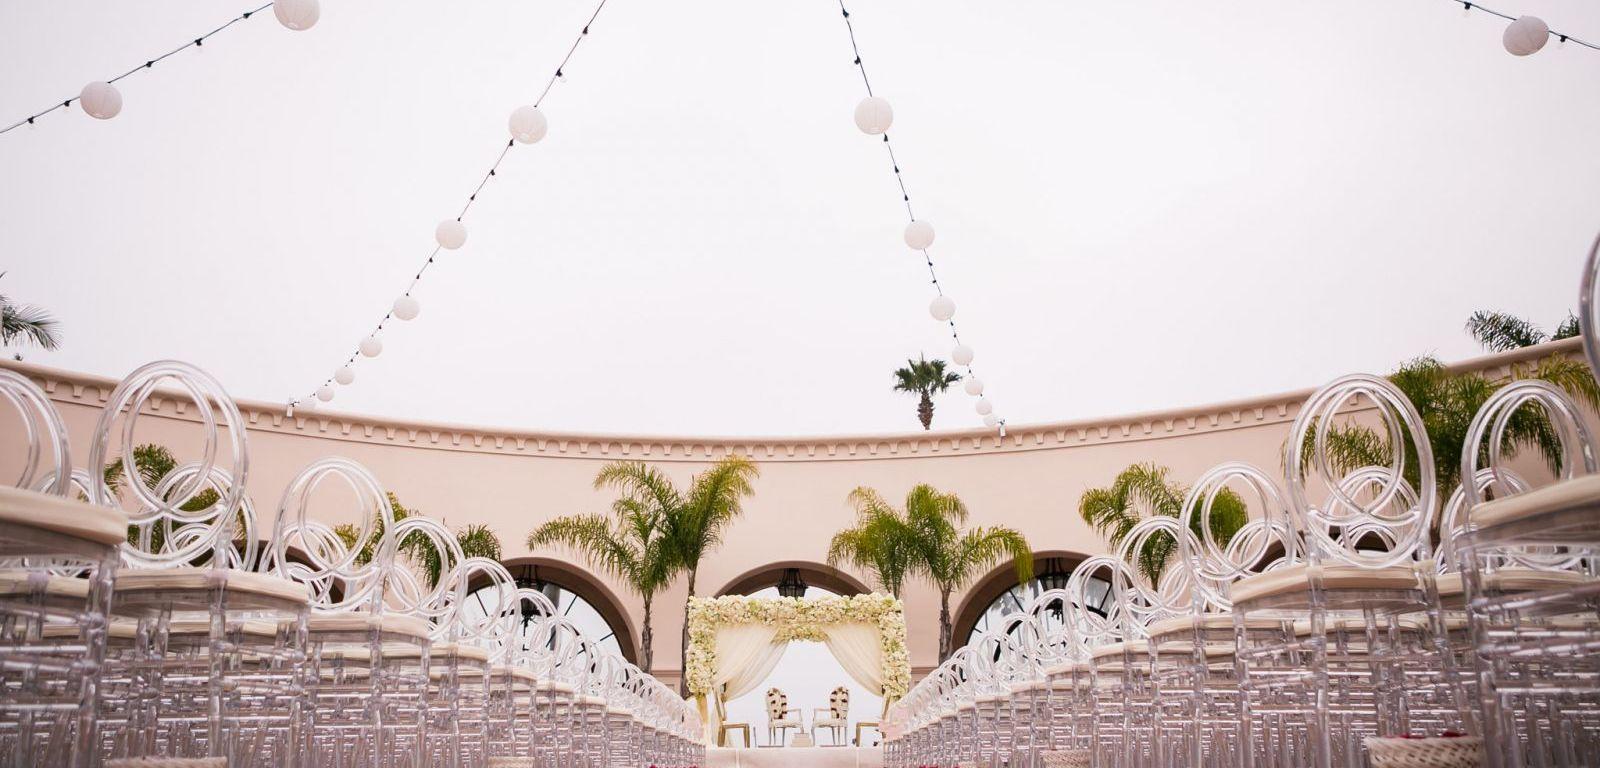 Indian wedding ceremony mandap at the Hilton Beachfront Resort in Santa Barbara